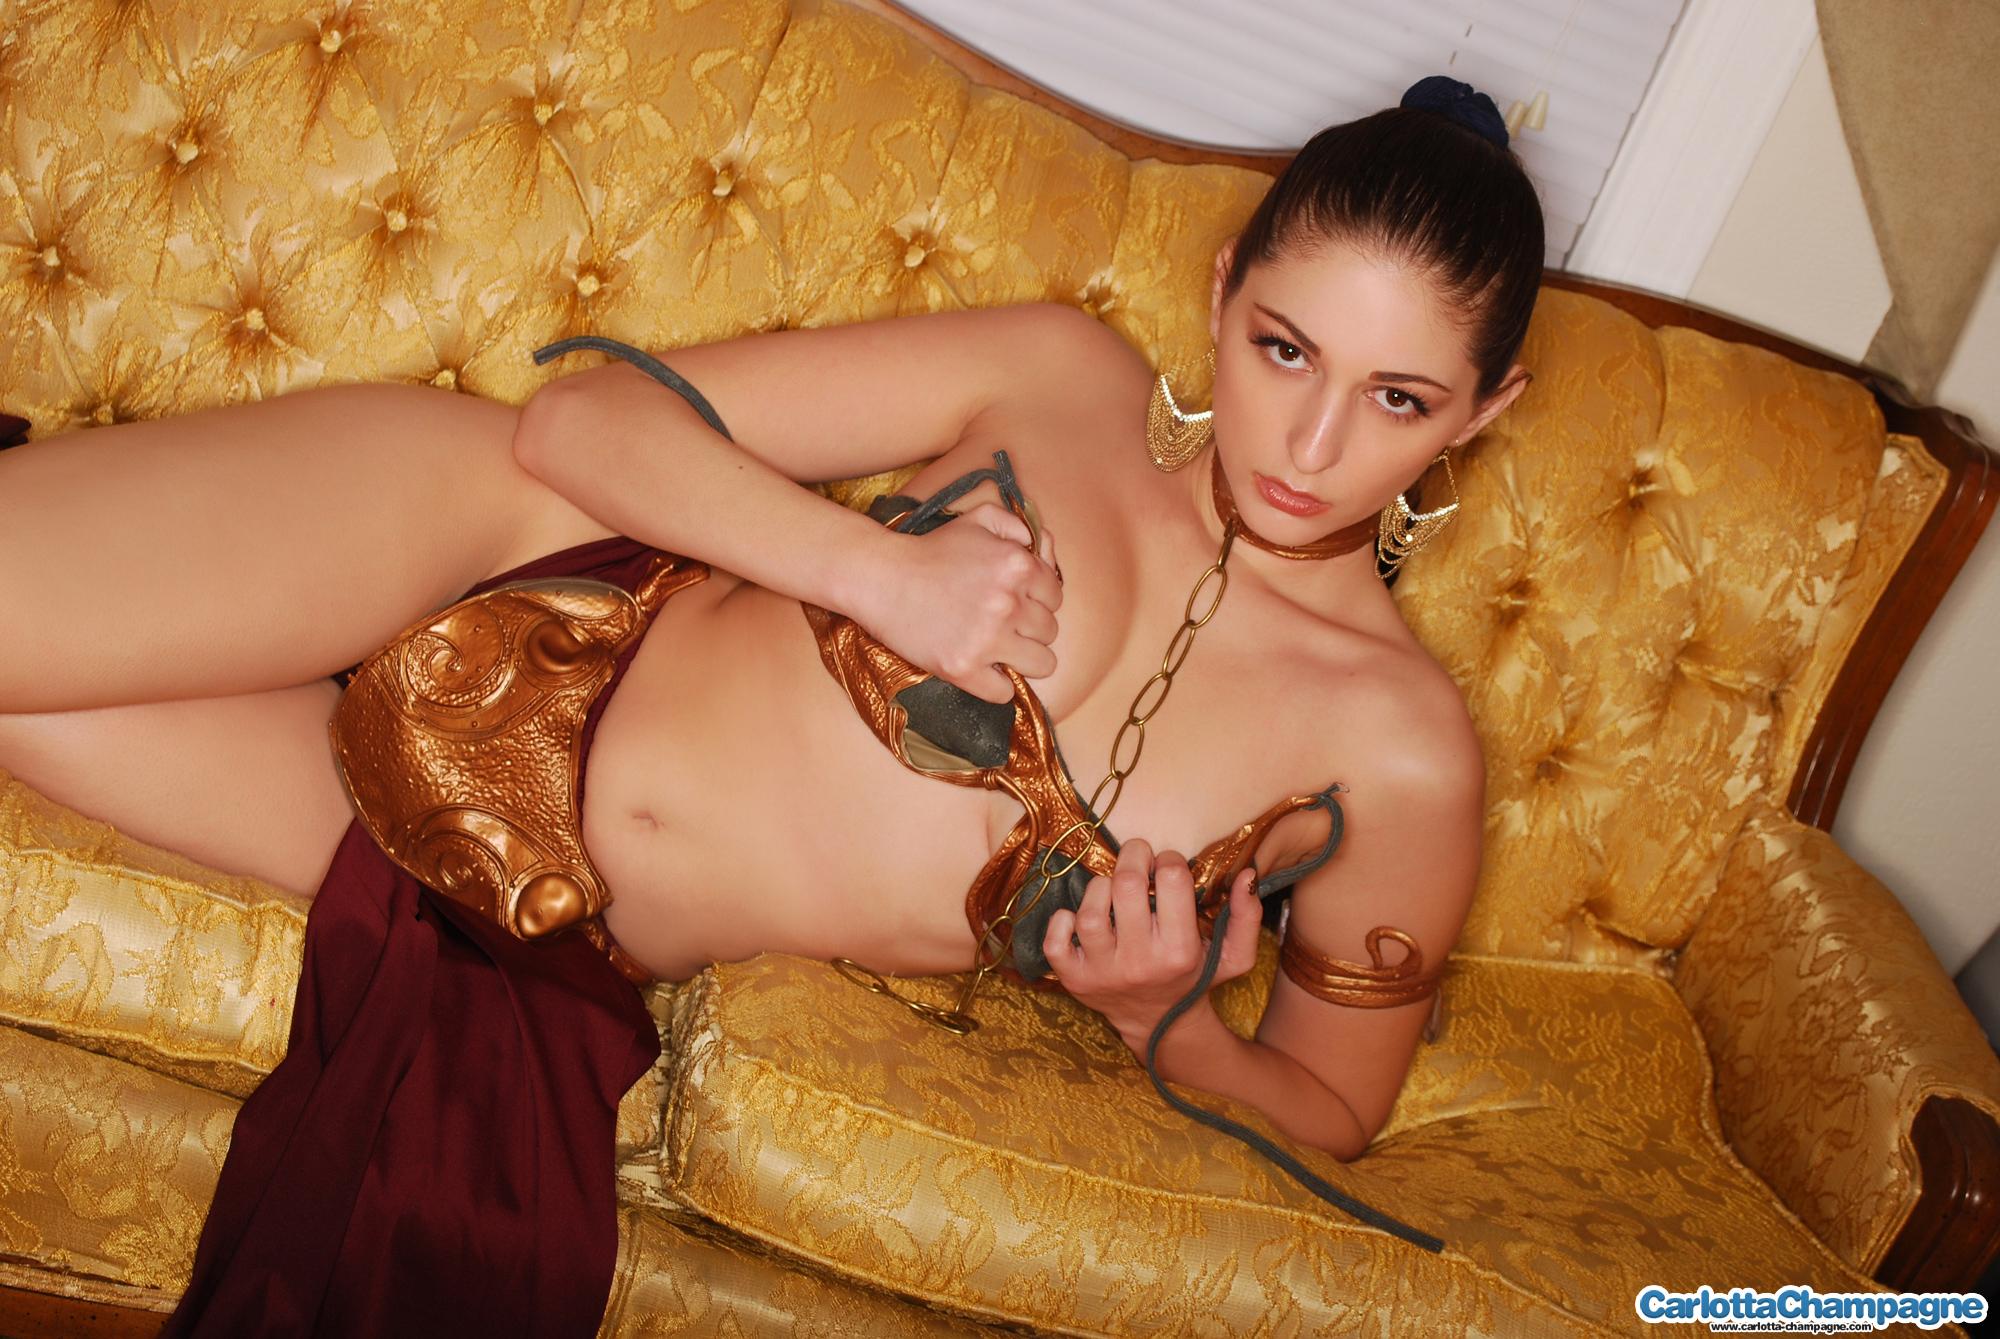 Sexy nude star wars leia hentai porno videos